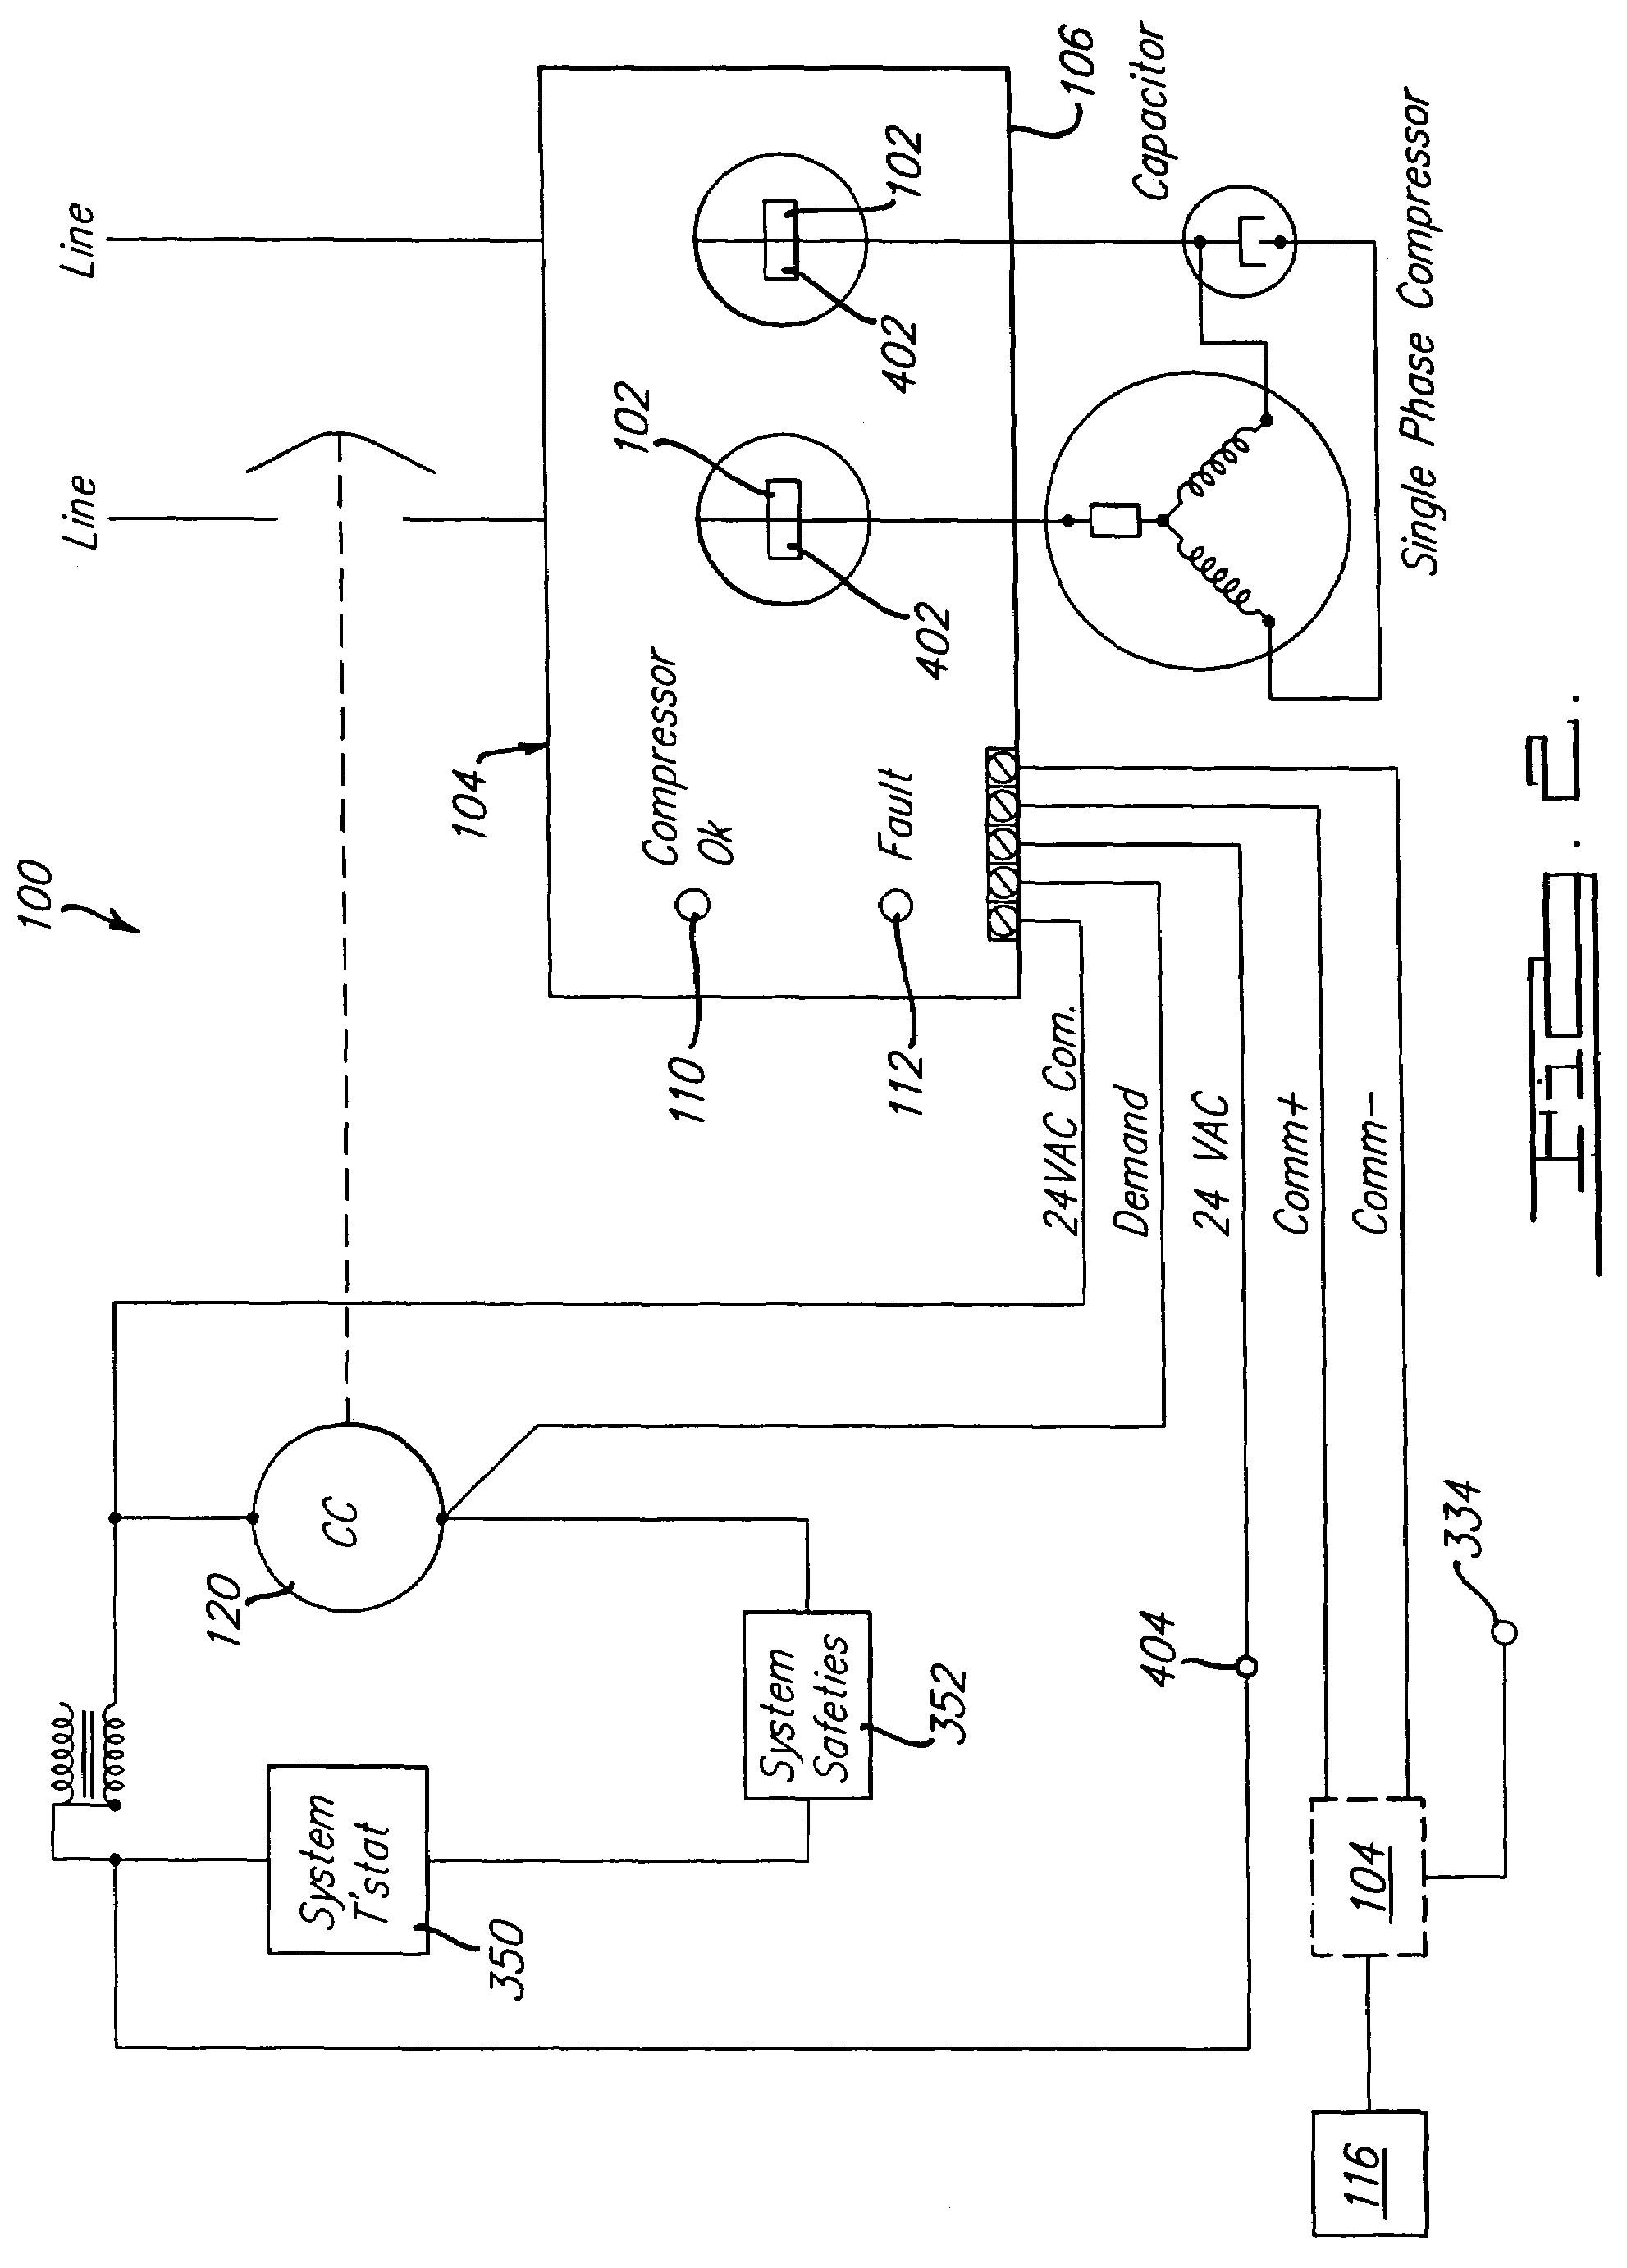 Wiring Diagrams Copeland pressor Hvac Ac Contactor Beauteous In